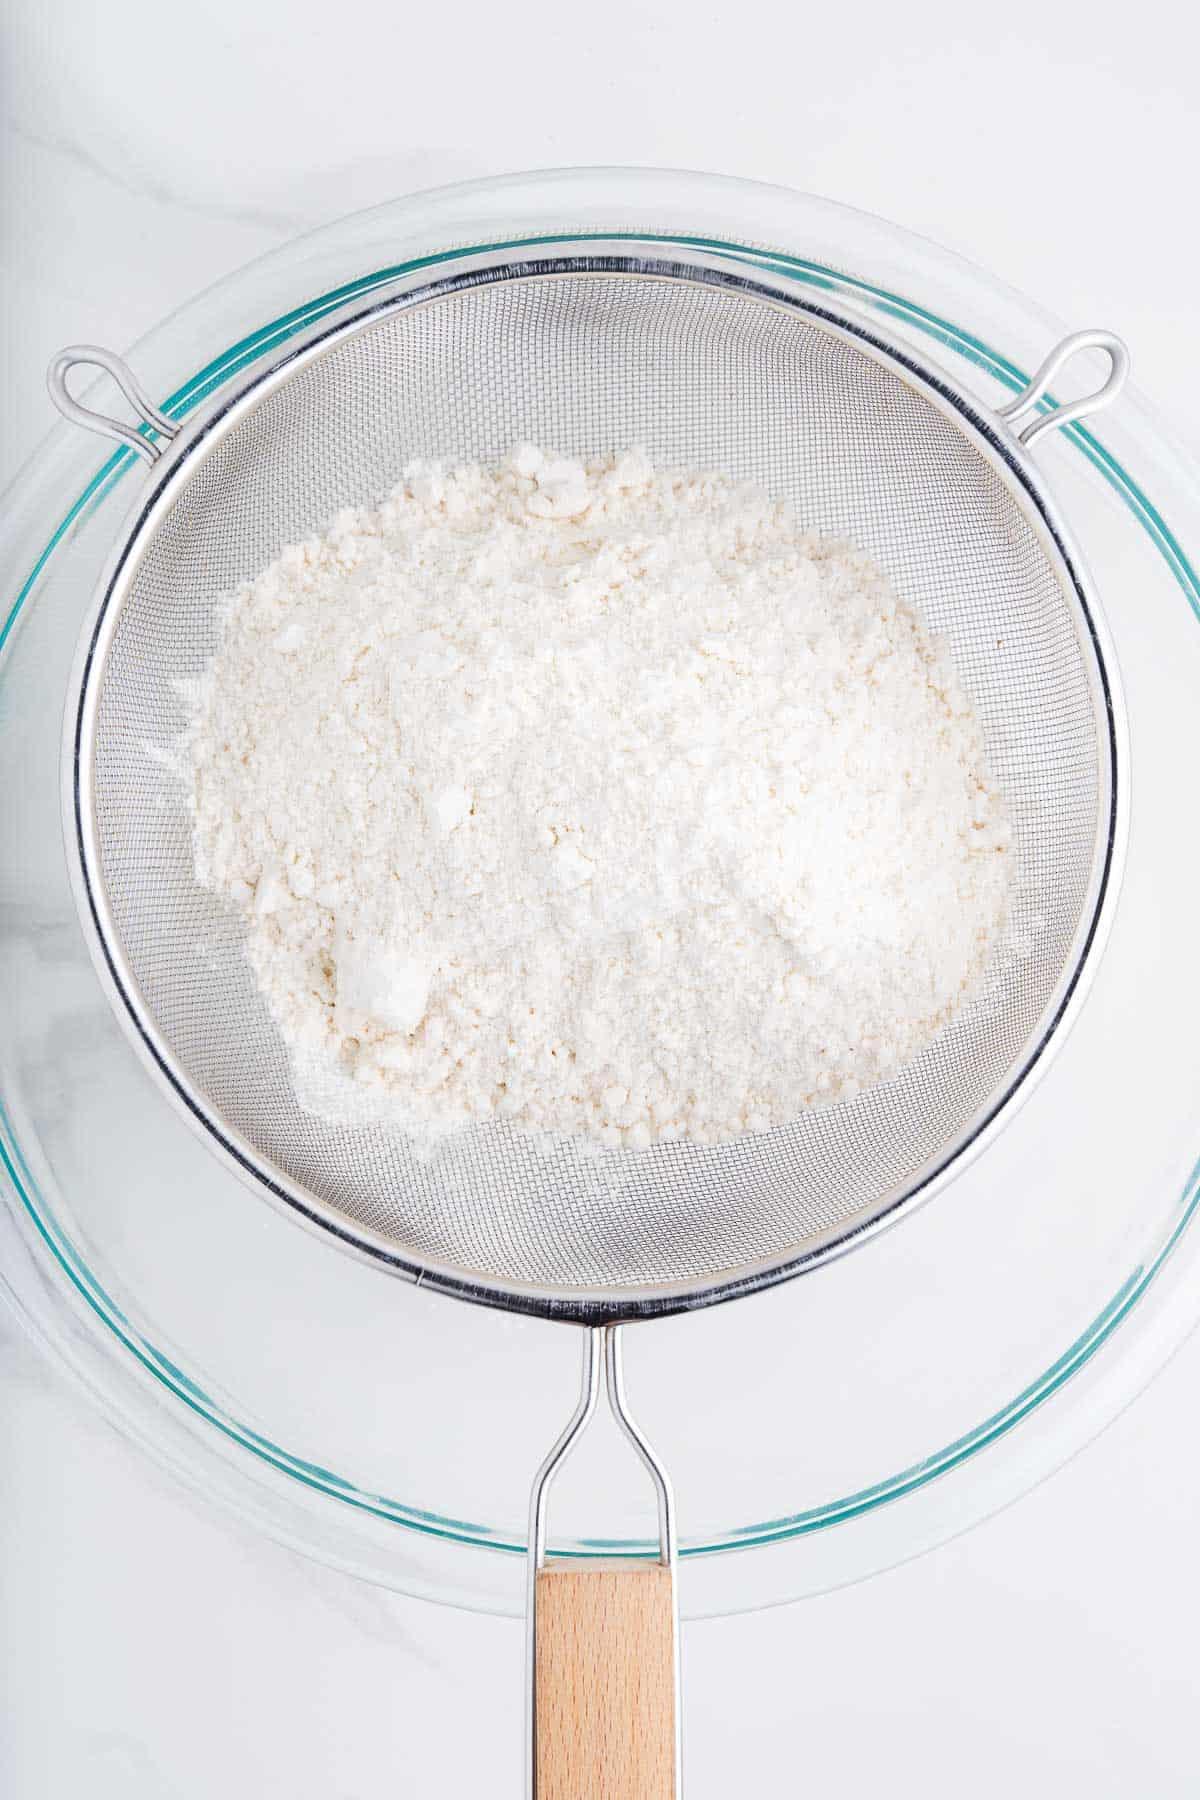 Flour Sifting Through a Strainer into a Bowl